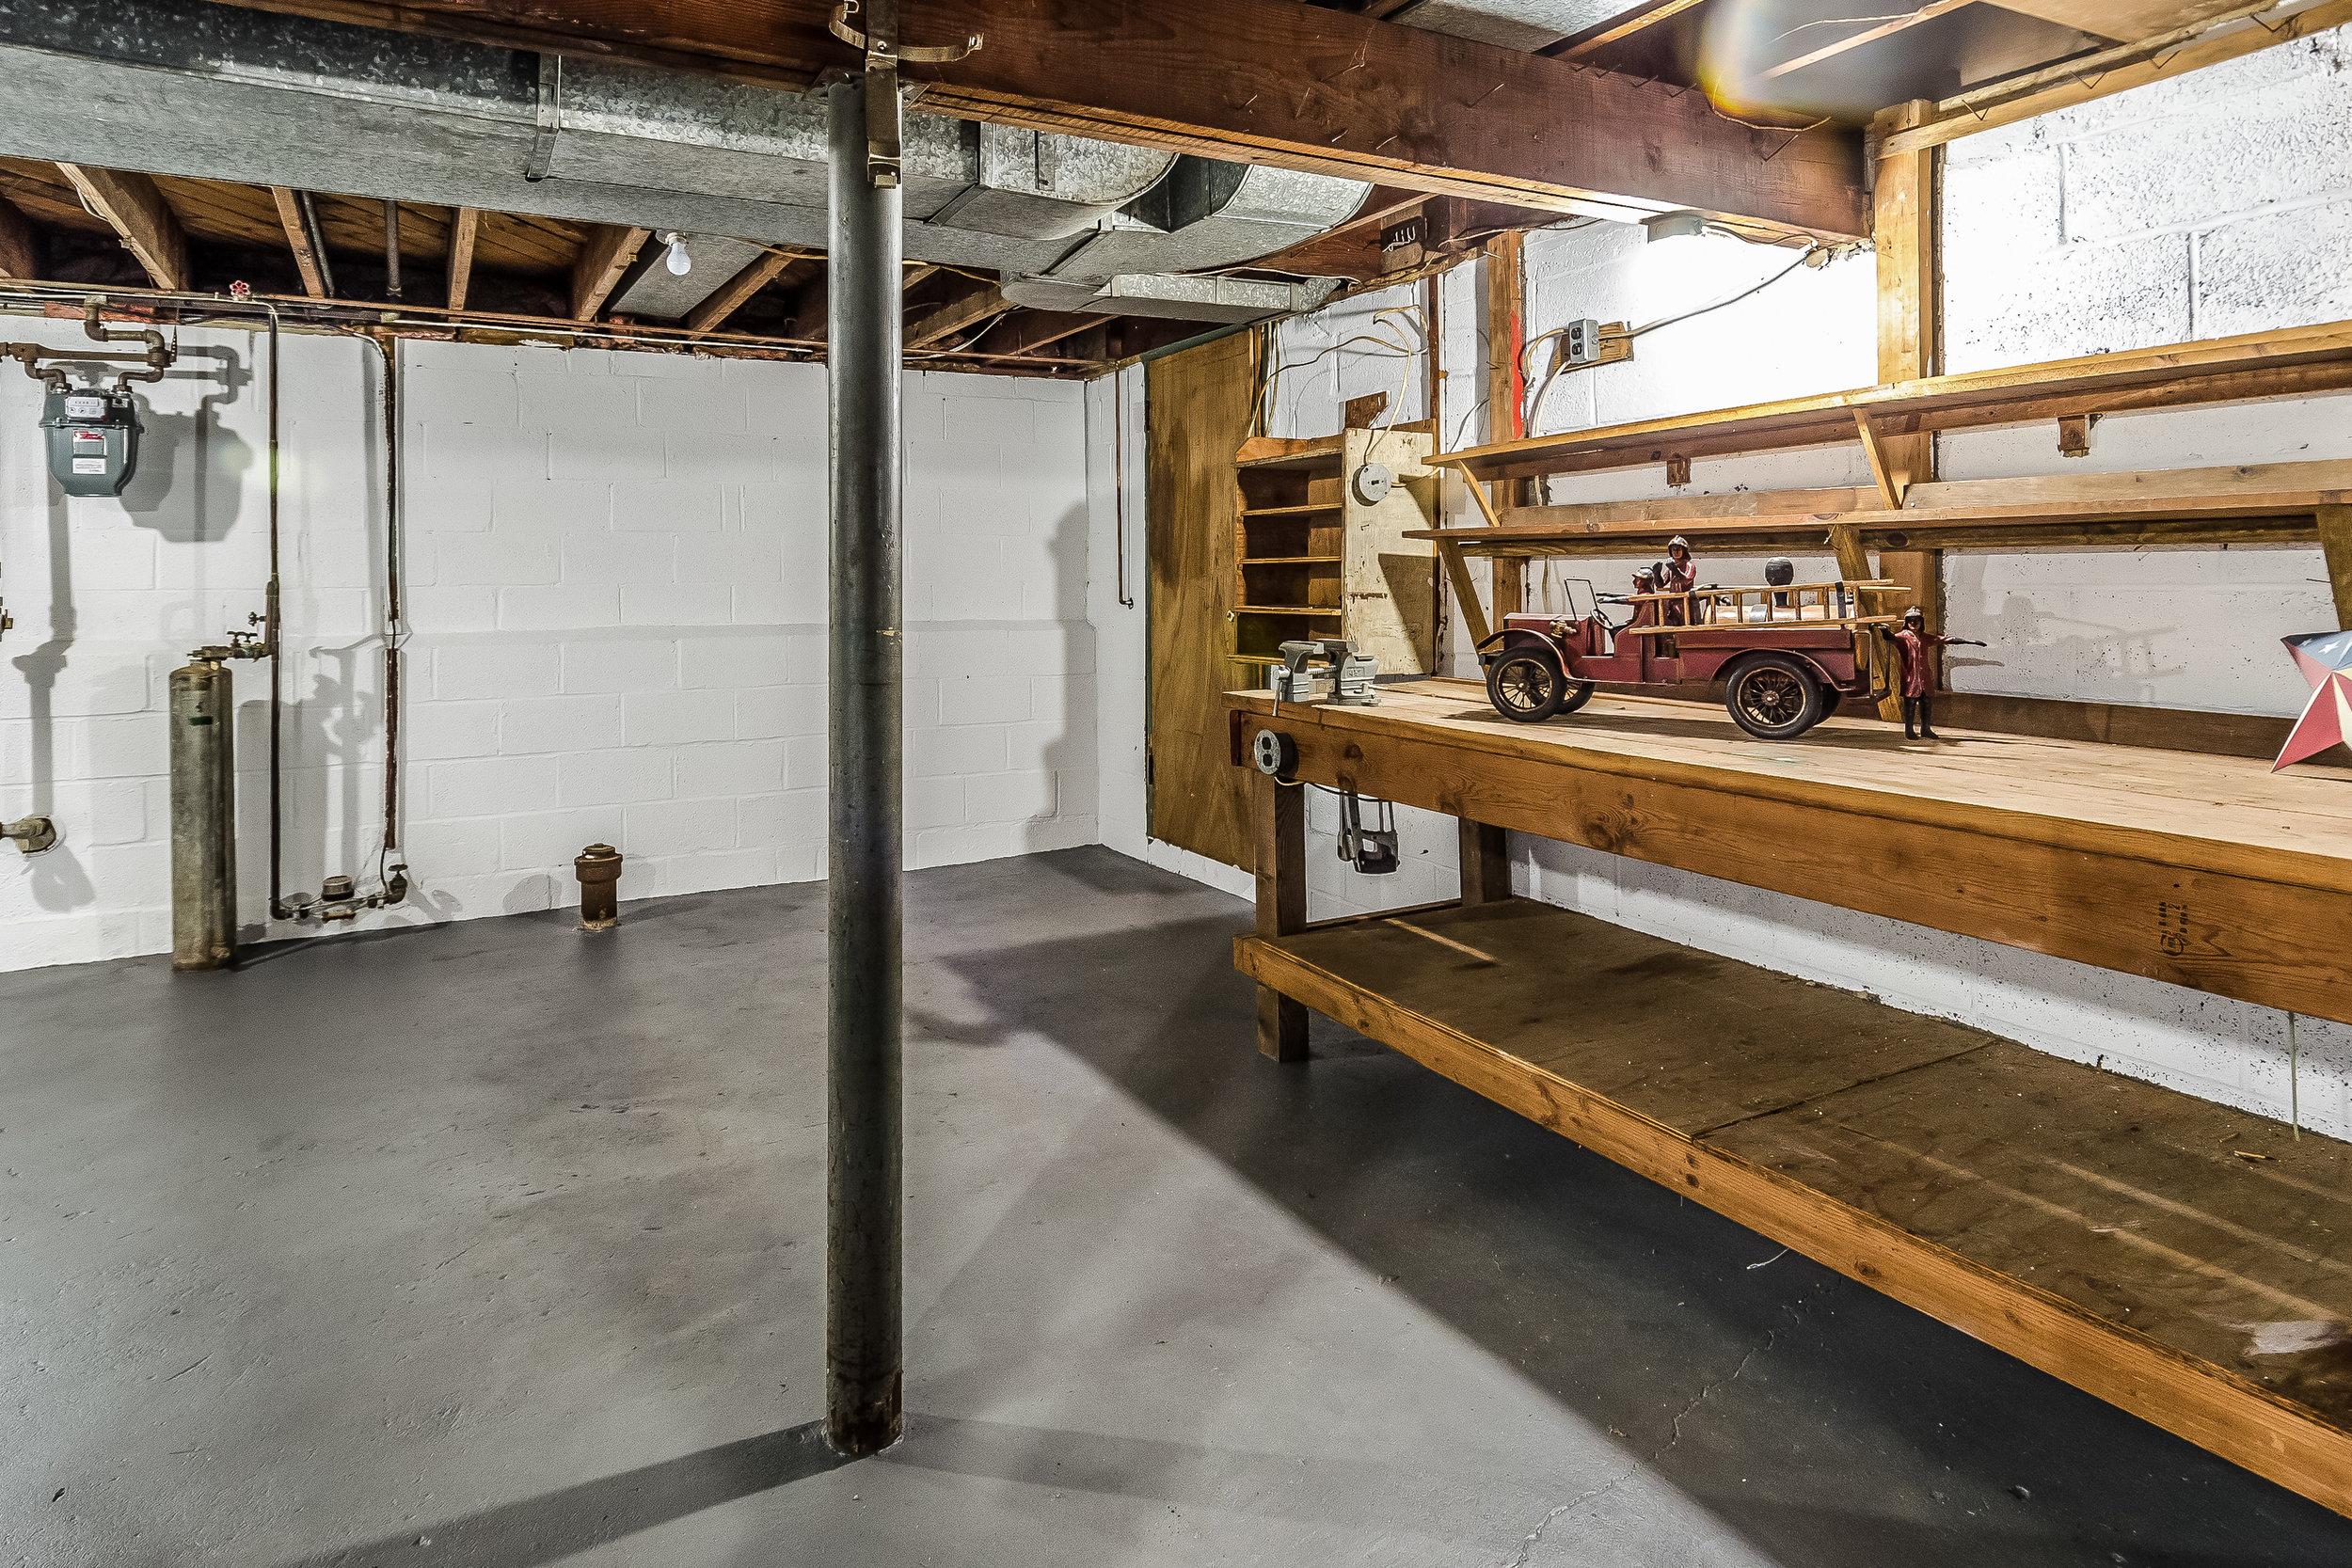 037-photo-unfinished-basement-5786579.jpg